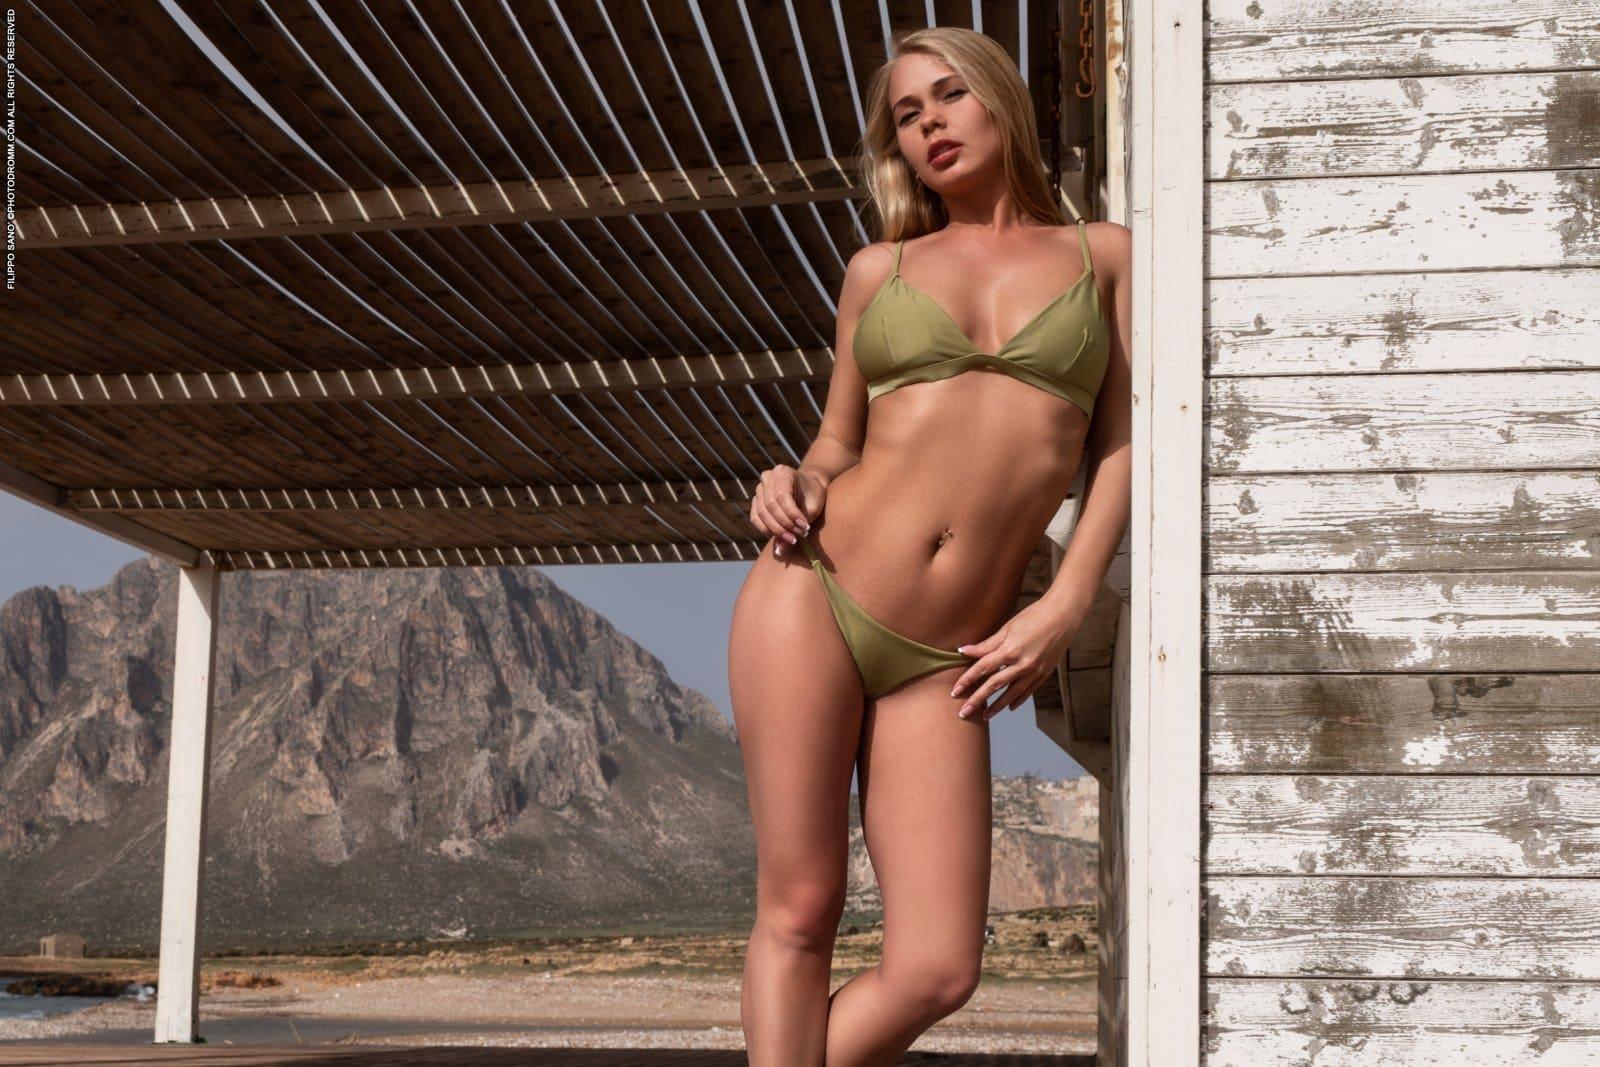 Enjoys Posing Naked - Hot blonde Darna enjoys posing naked outside